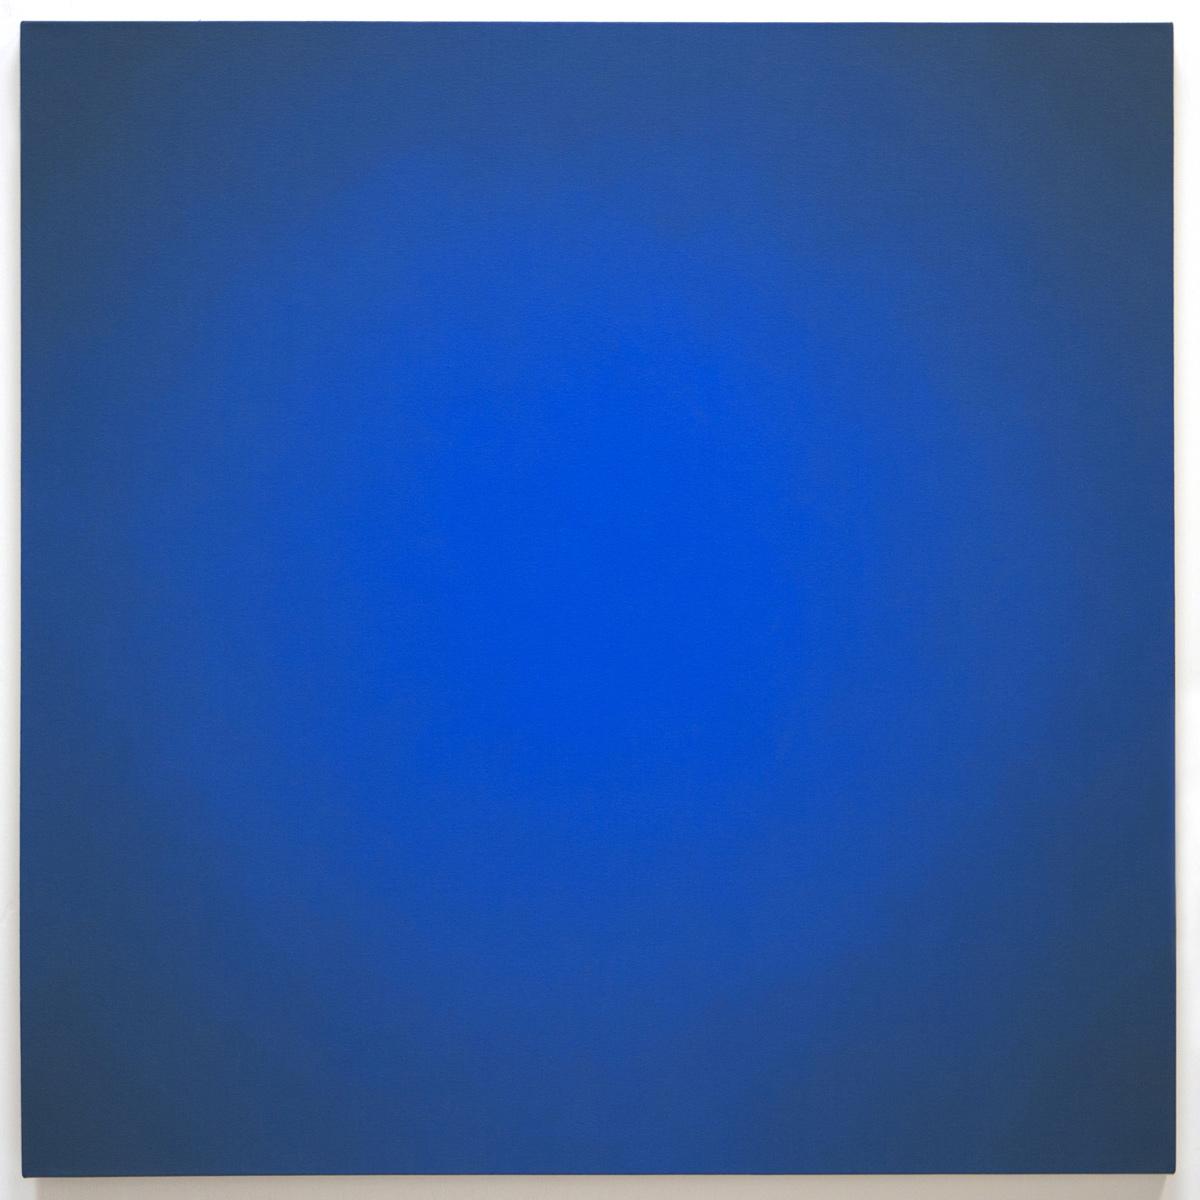 Blue Orange #5 (Yellow-Orange), Equivalence Blue Orange Series, 2005, oil on canvas, 30 x 30 in. (76 x 76 cm.)